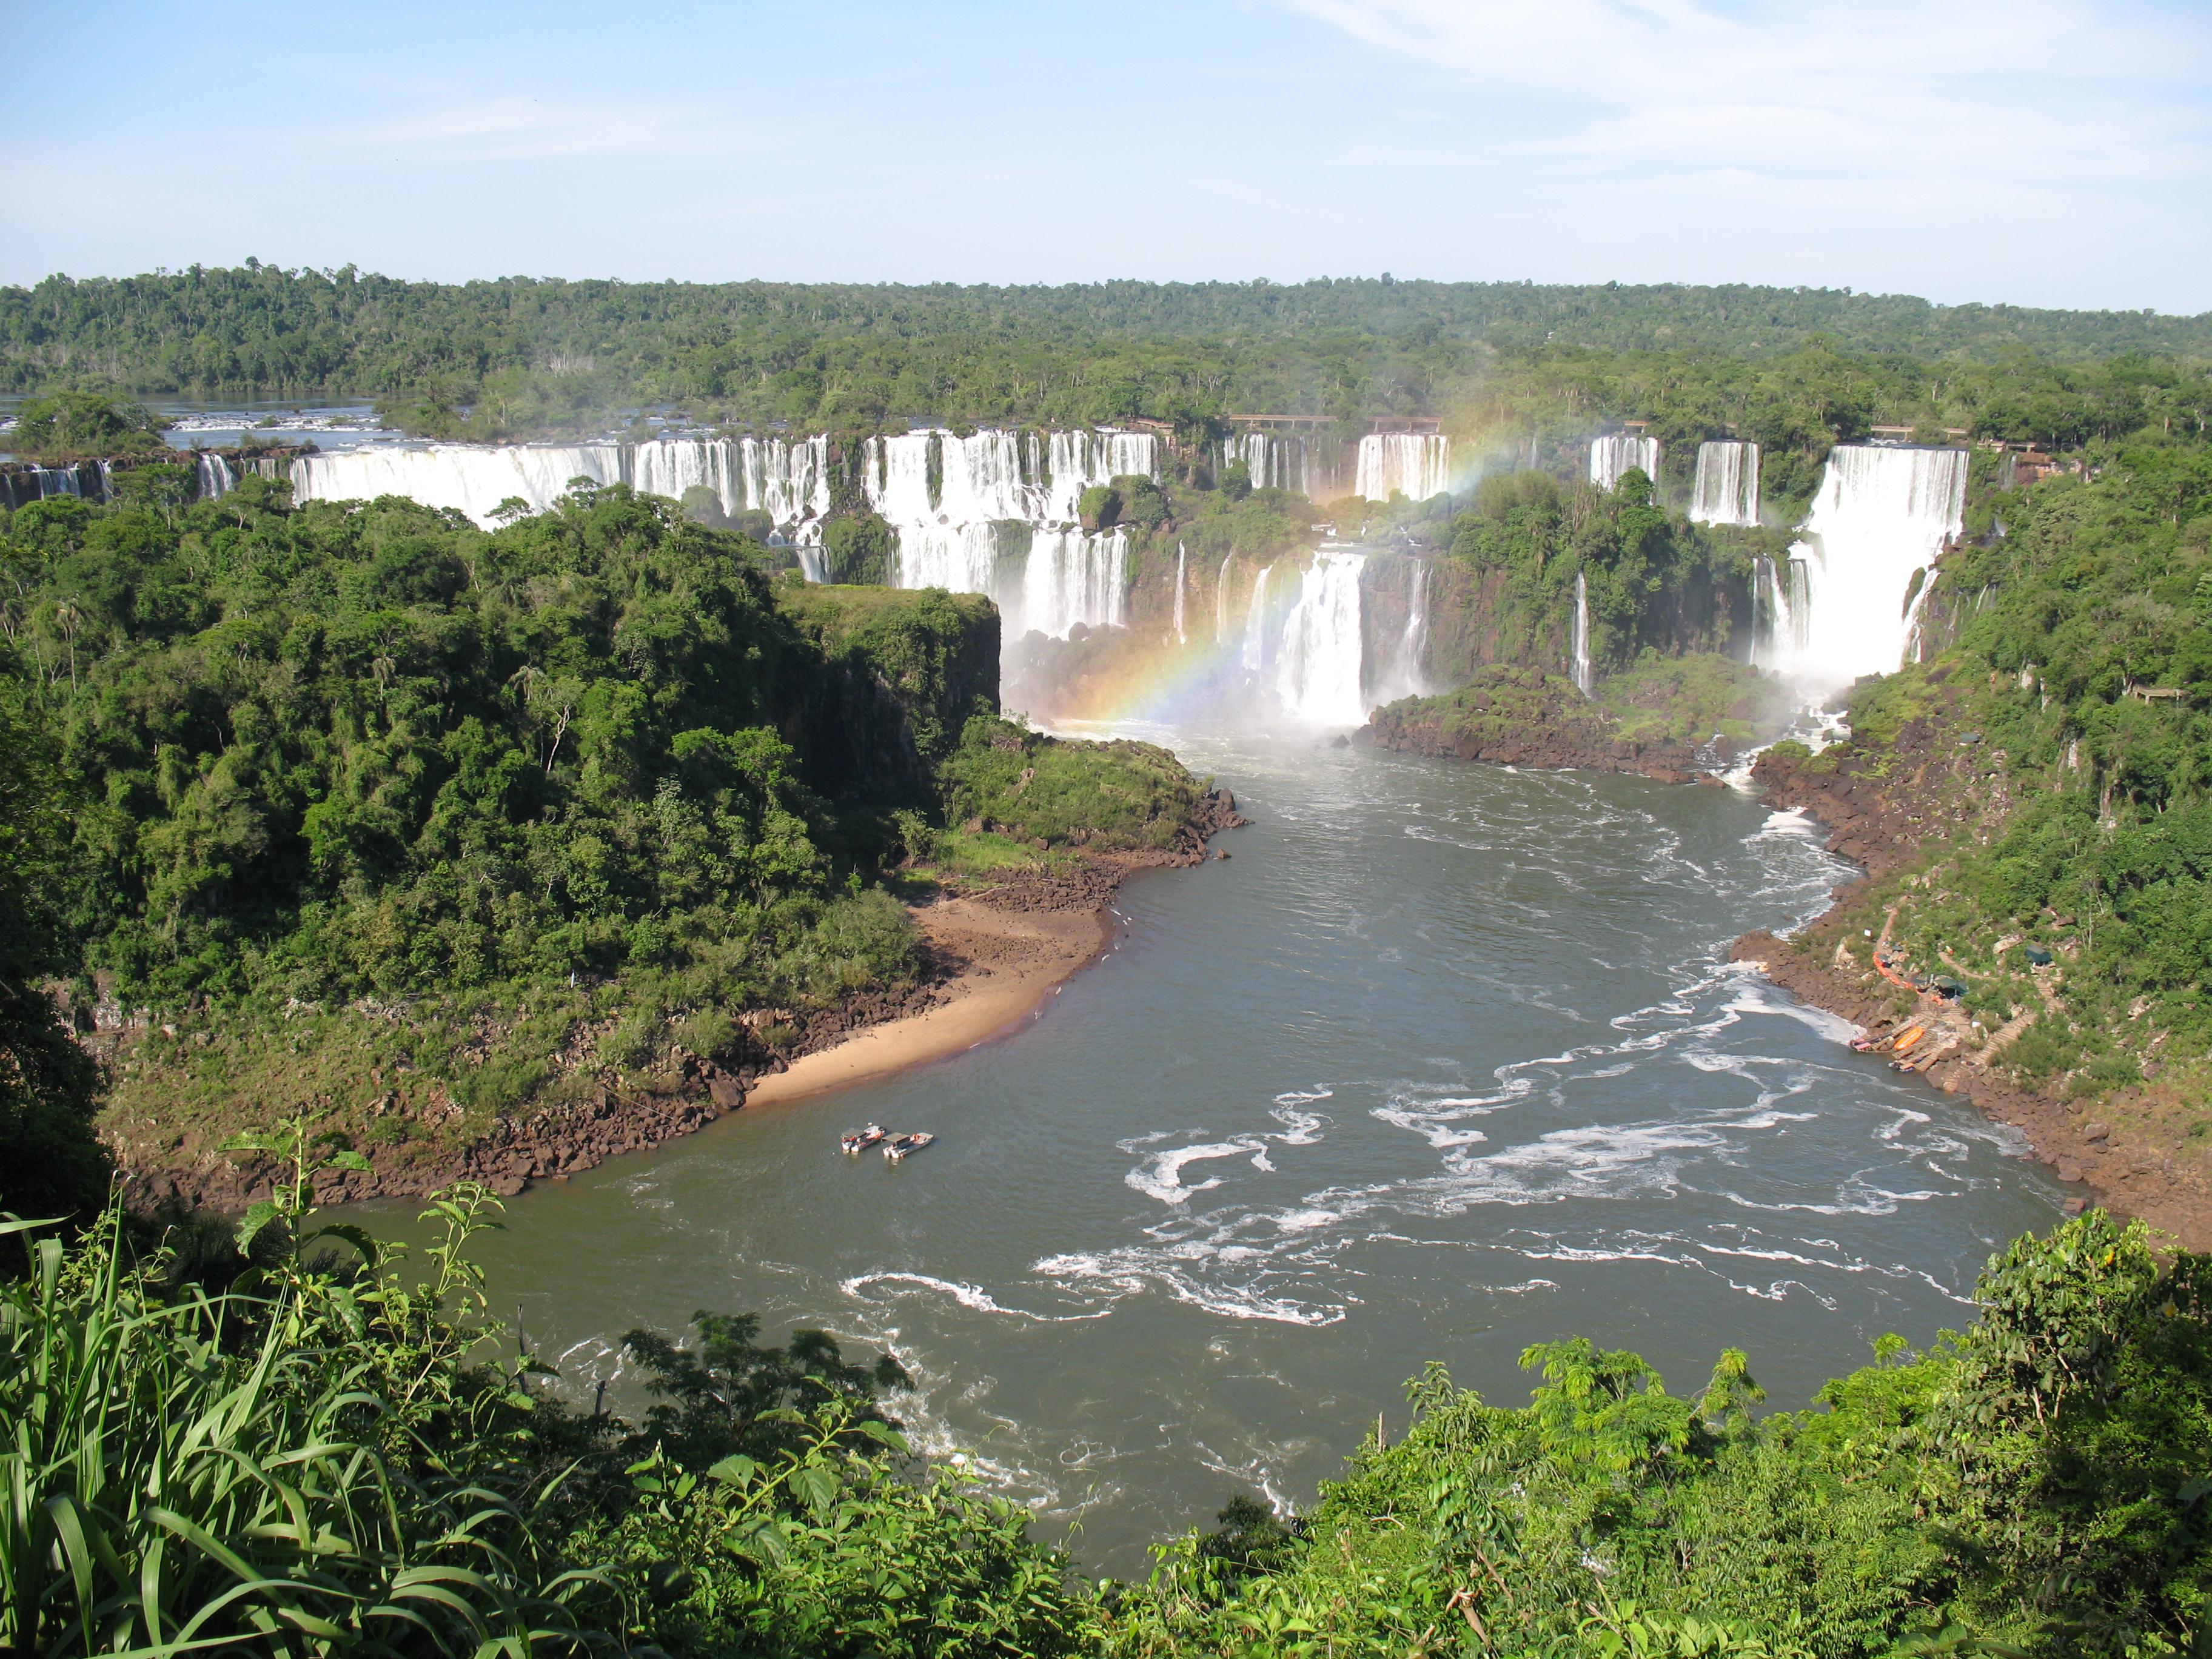 Iguazul Falls Wallpaper File Iguazu Wasserfaelle 01 Jpg Wikimedia Commons